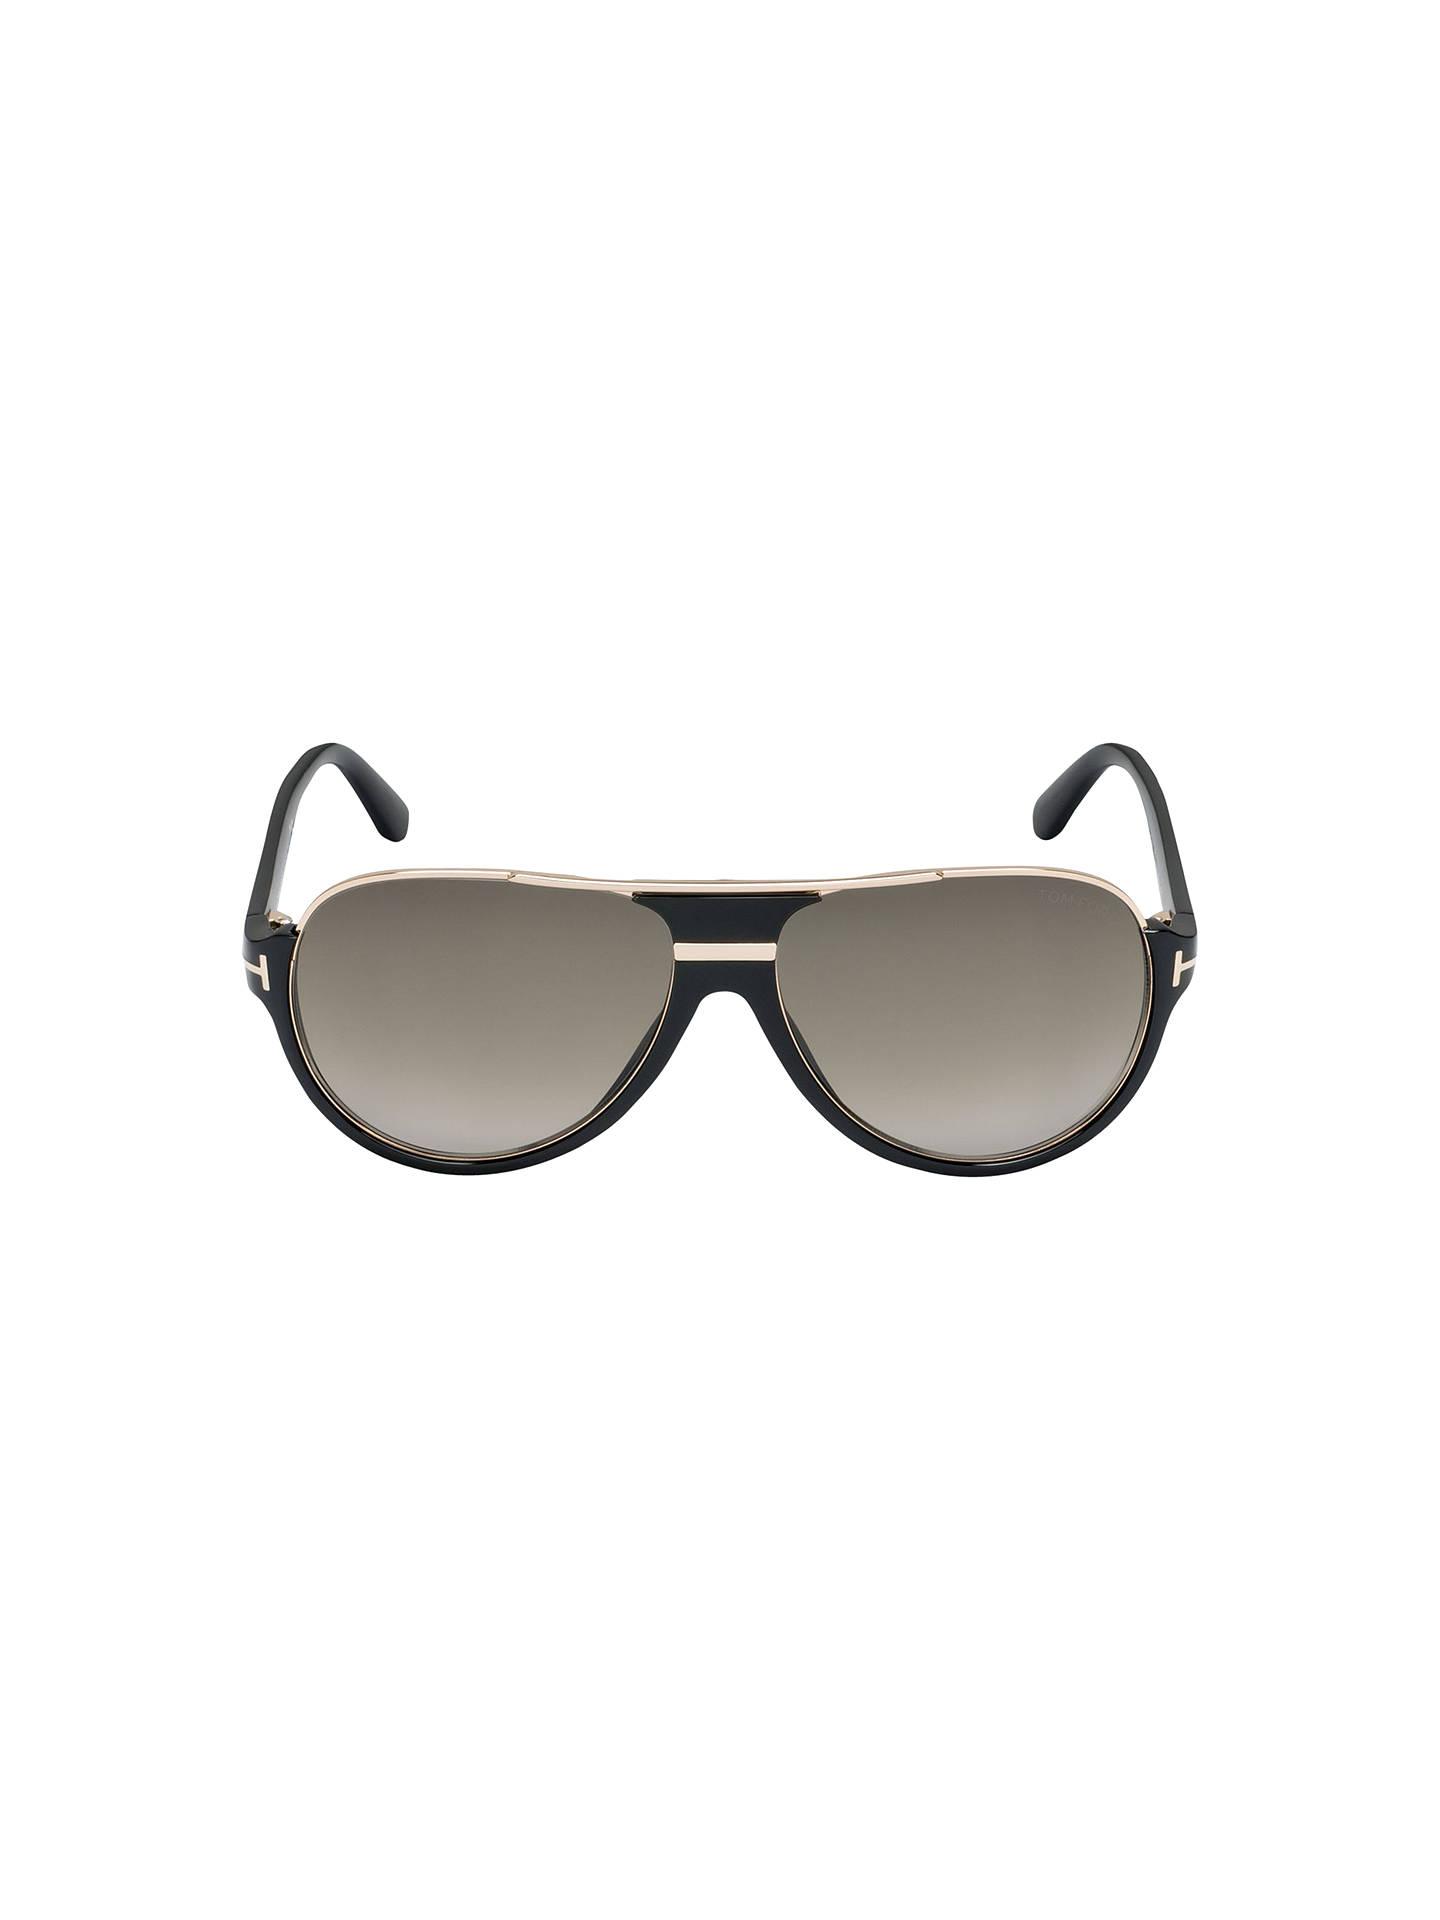 5797f4e13dc6b ... Buy TOM FORD FT0334 Dimitry Vintage Aviator Sunglasses